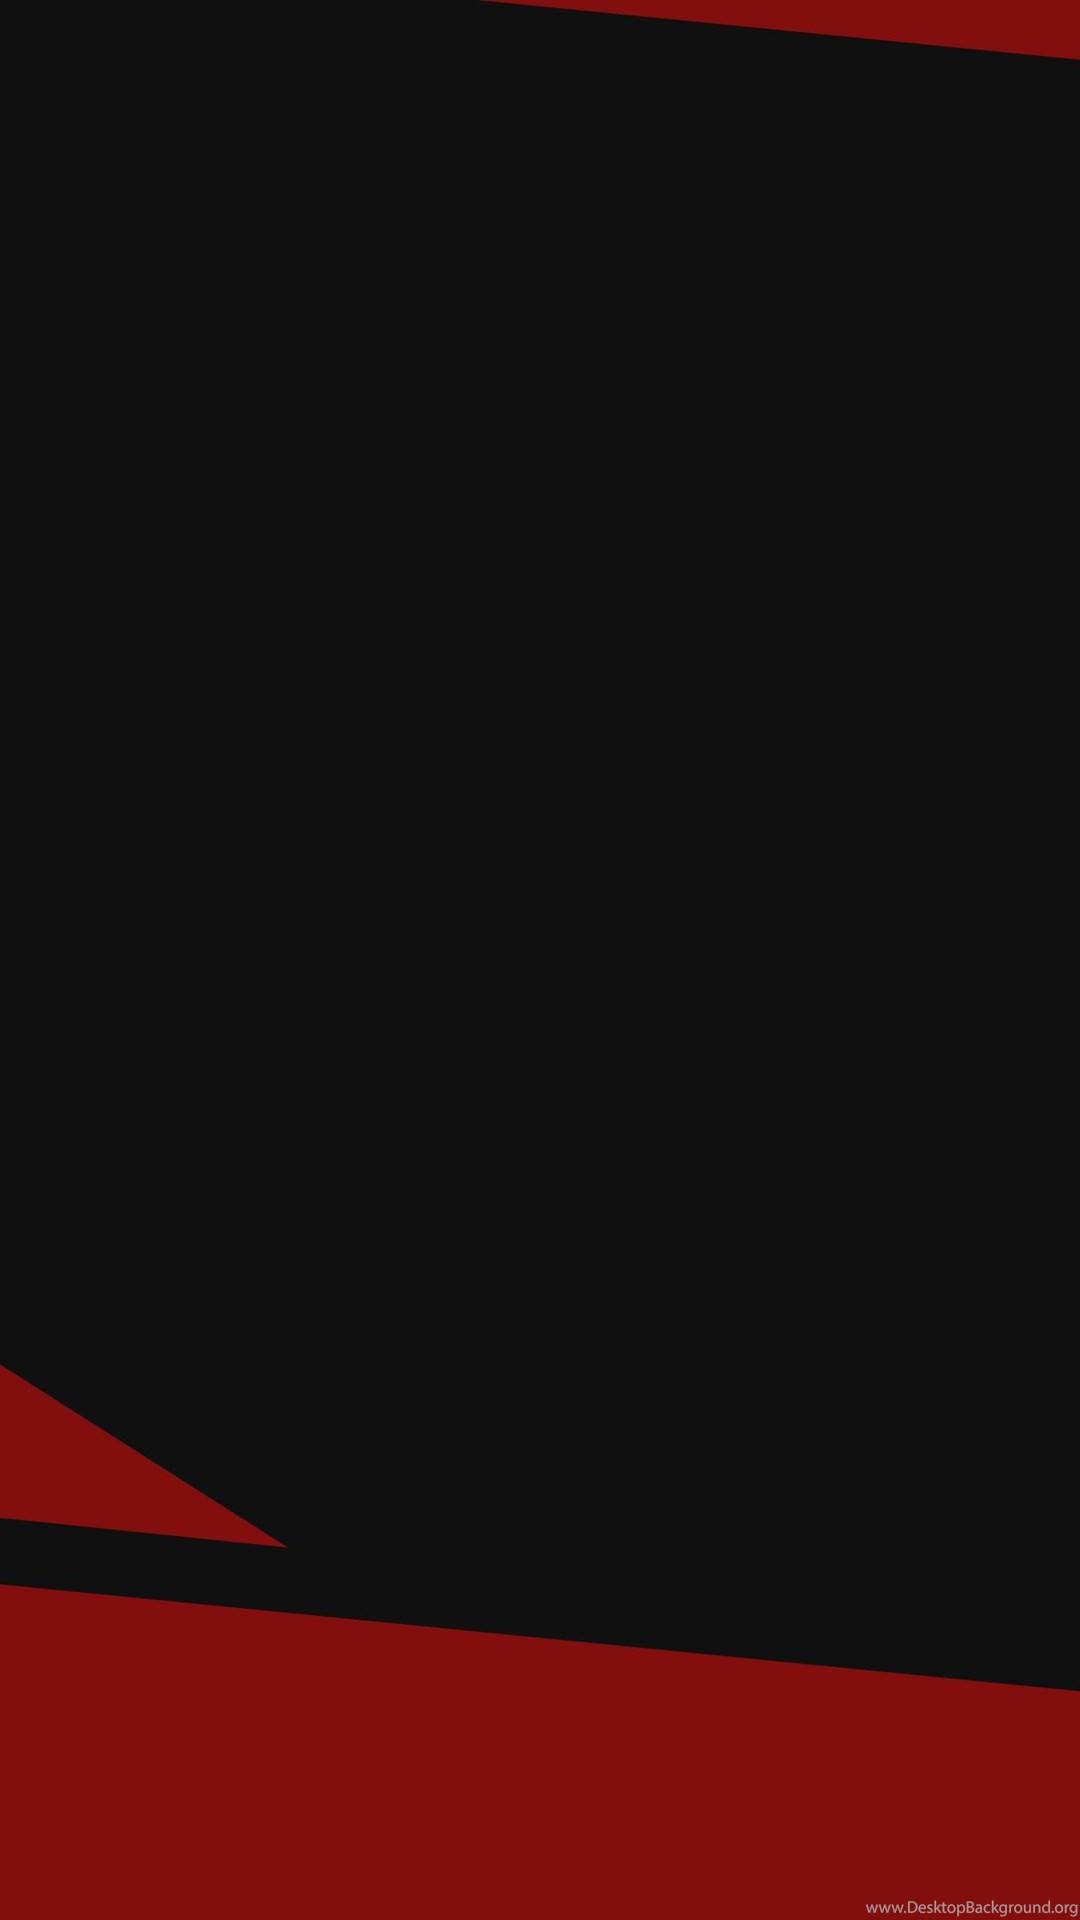 Rog Wallpapers 3840x2160 4k By Catweaselnl Album On Imgur Desktop